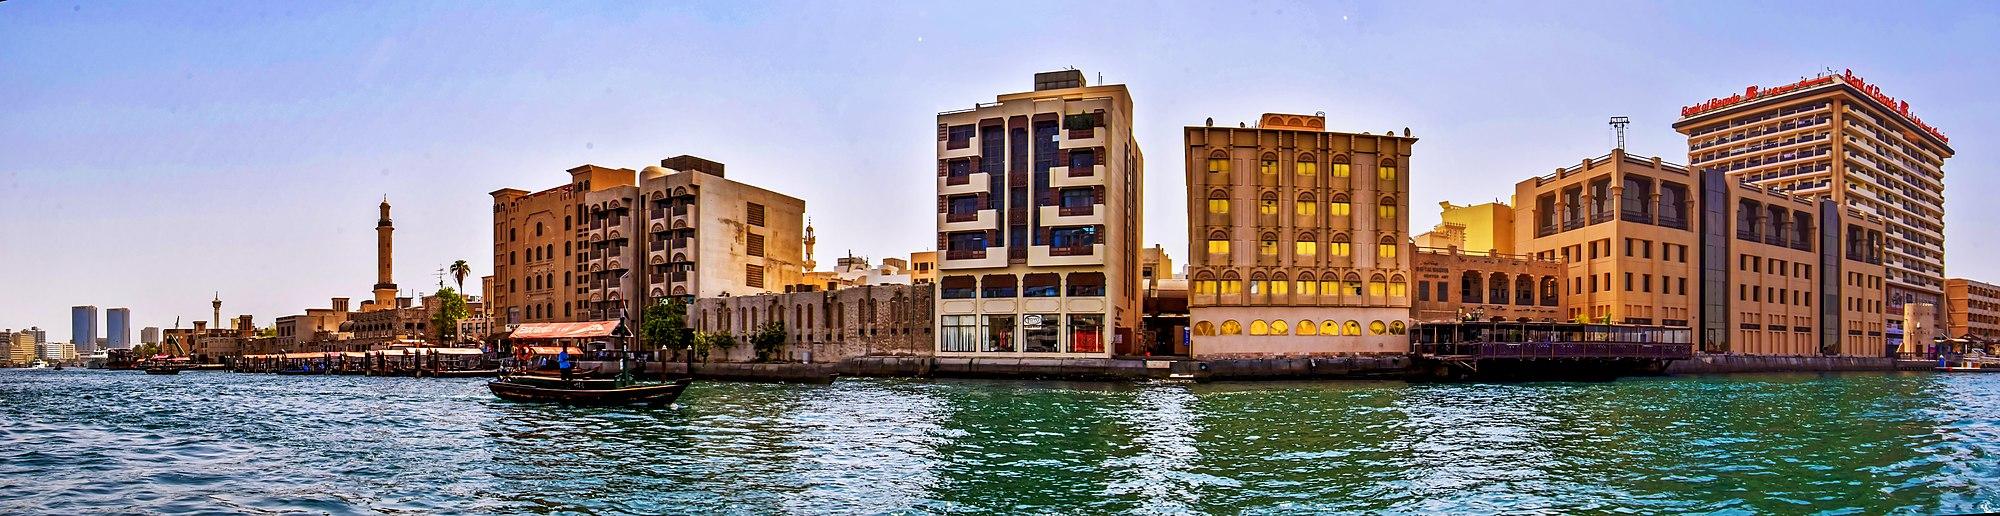 2000px-A_panorama_of_Dubai_Creek_on_September_28,_2018